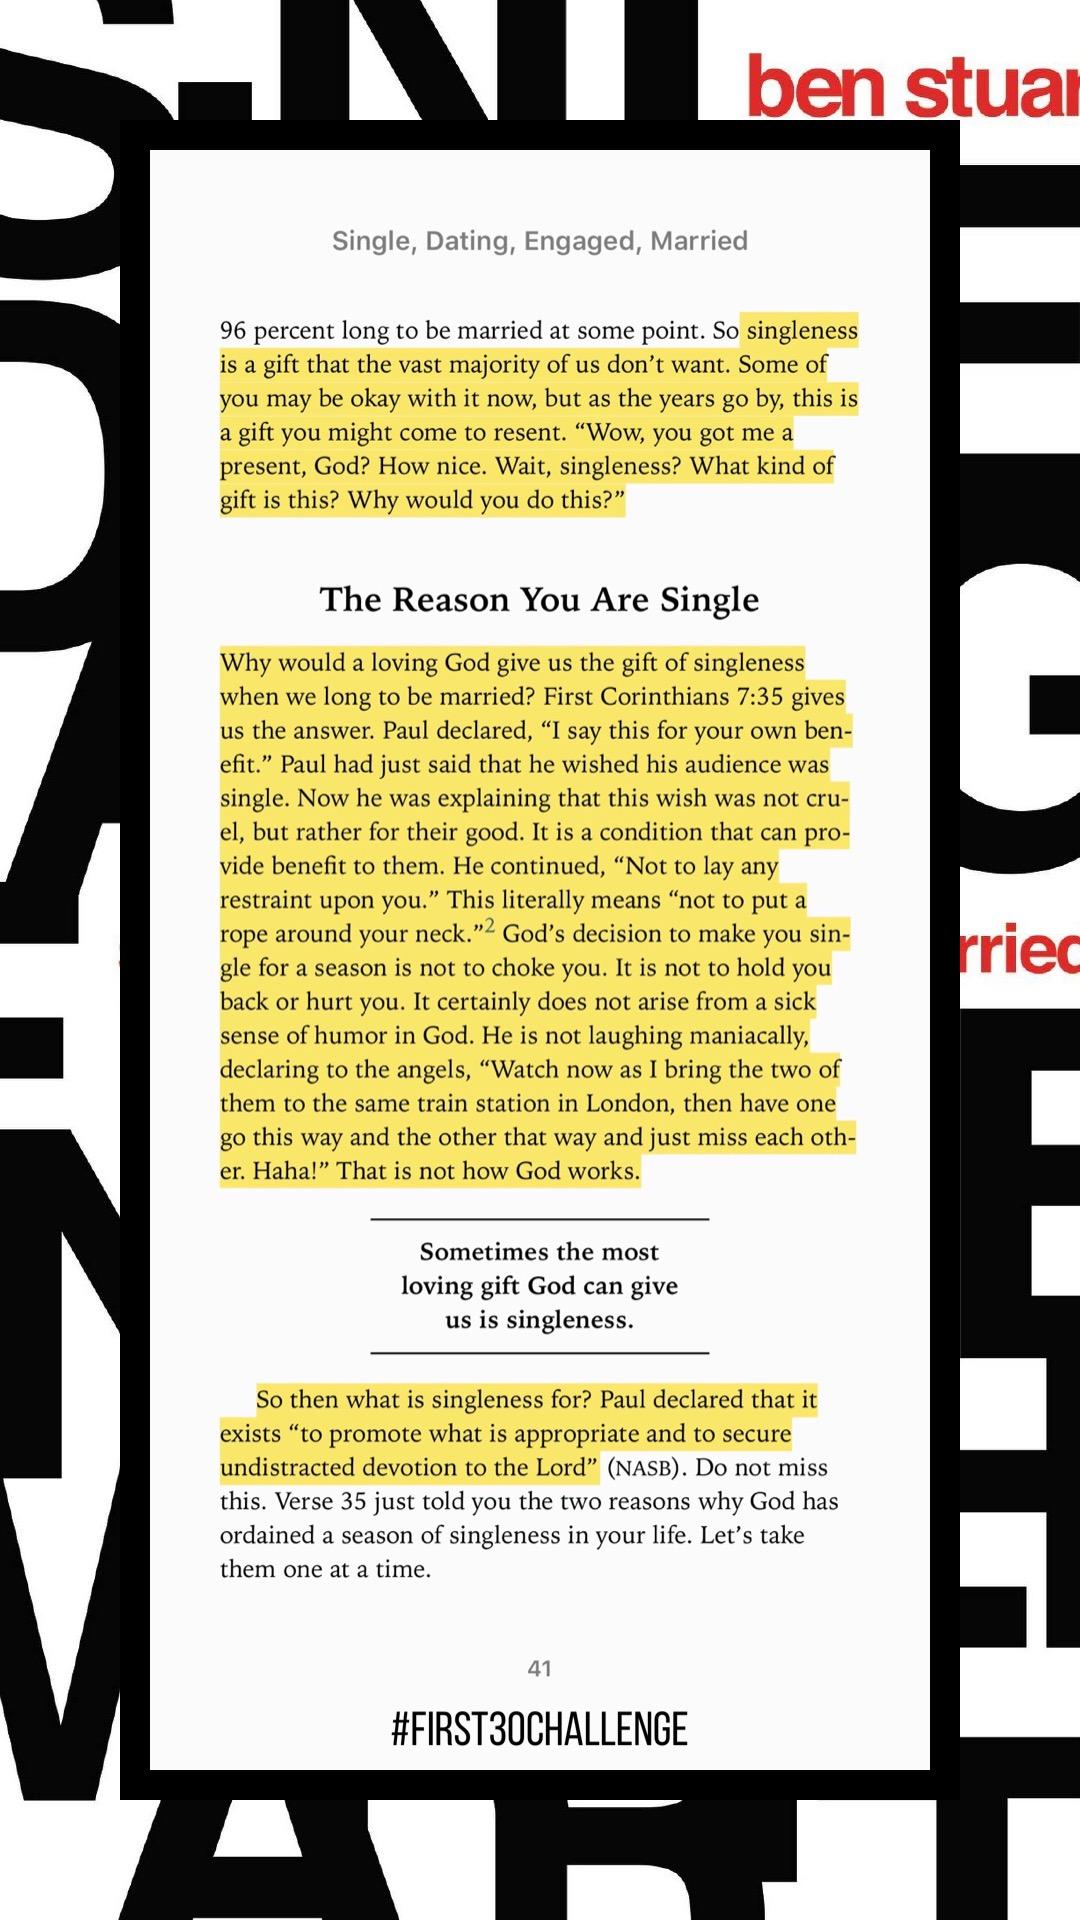 Singleness is a gift. -